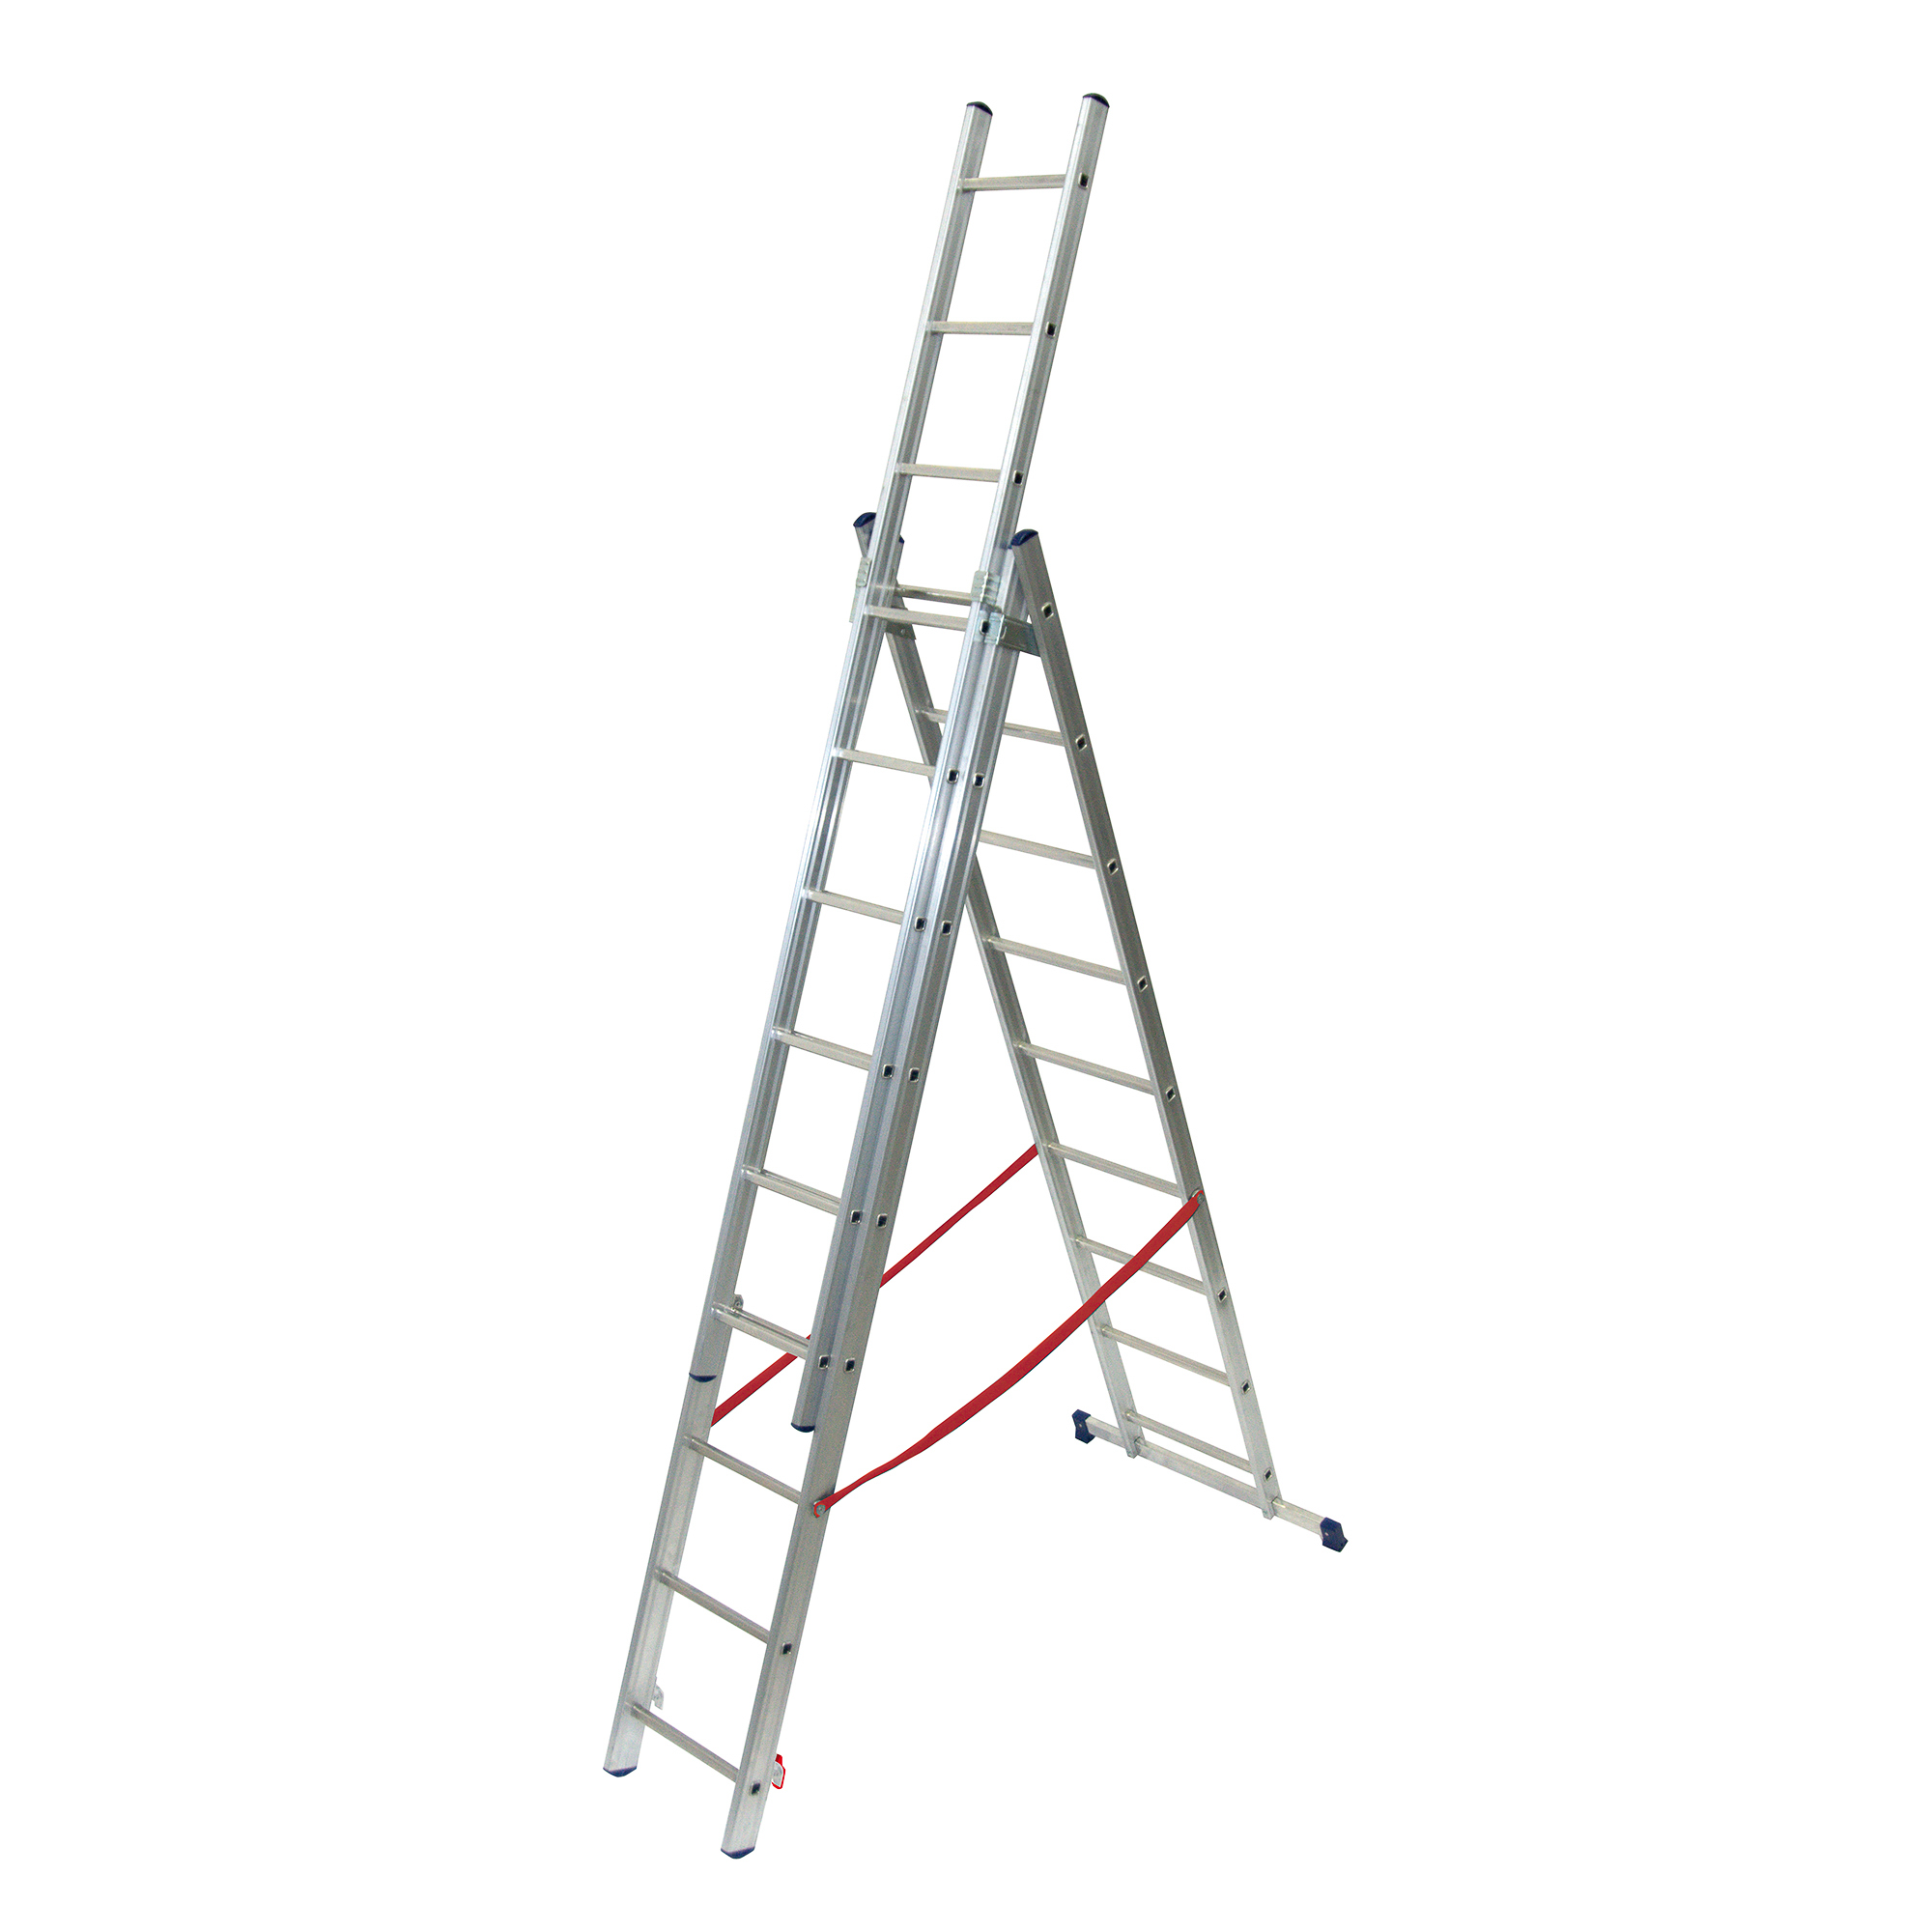 Light Duty 4 Way Combi Ladder